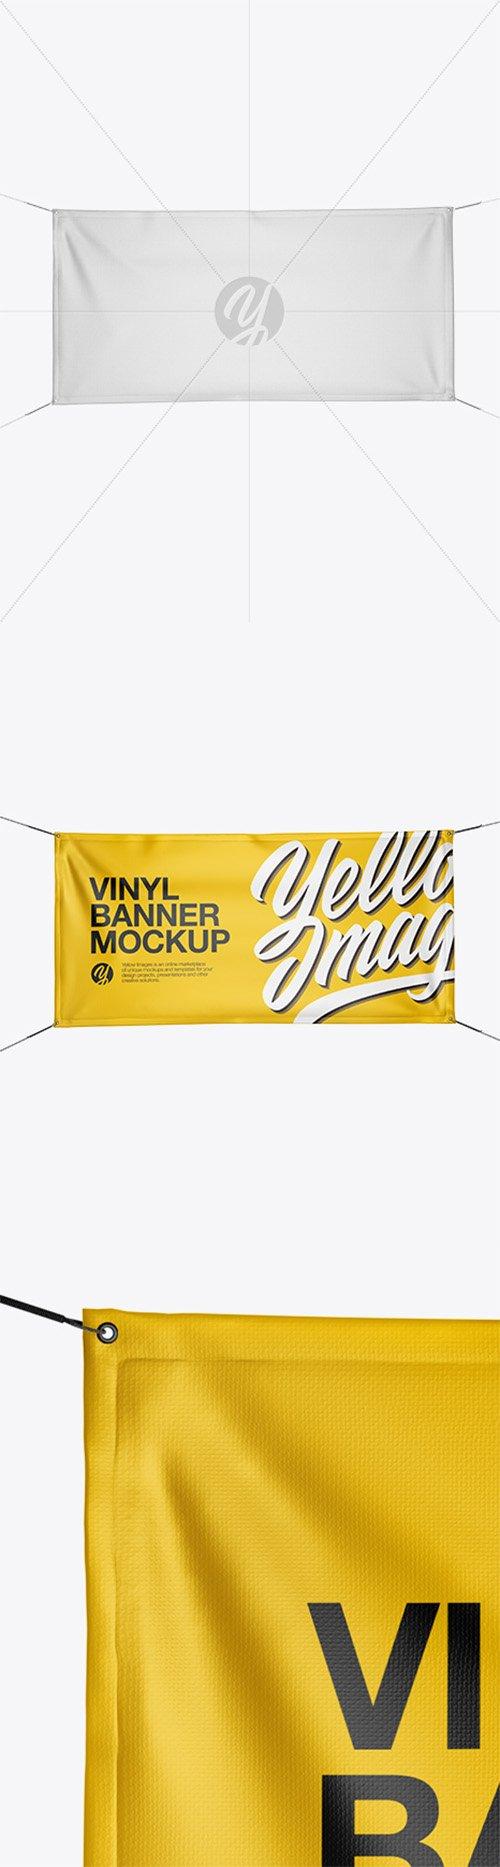 Glossy Vinyl Banner Mockup 22051 TIF